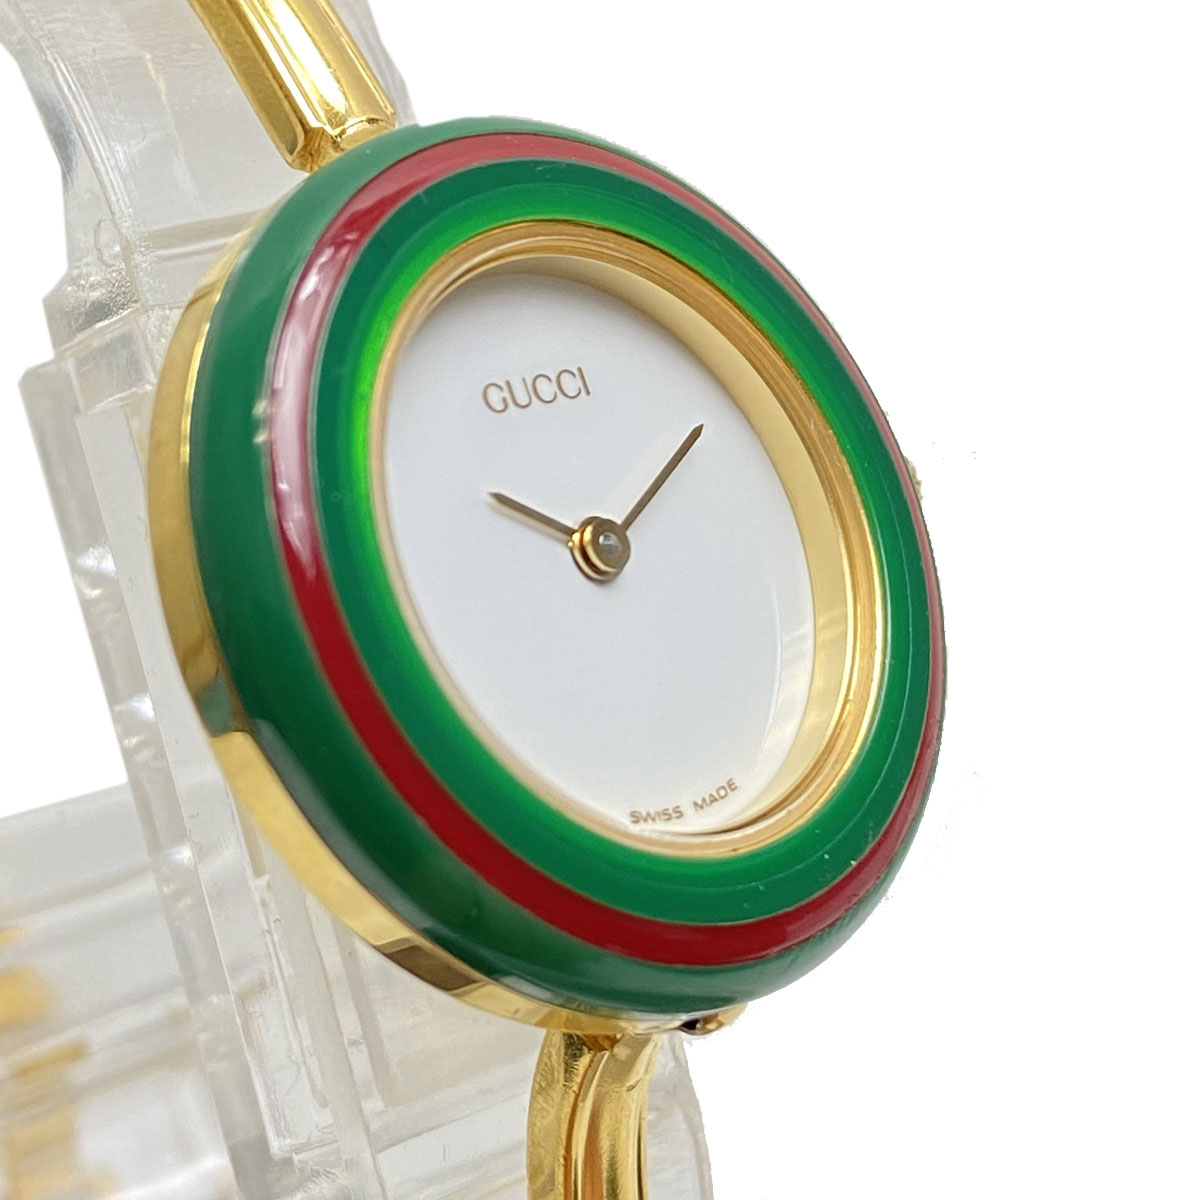 GUCCI グッチ レディース腕時計 チェンジベゼルウォッチ 12色 クオーツ QZ  11/12.2